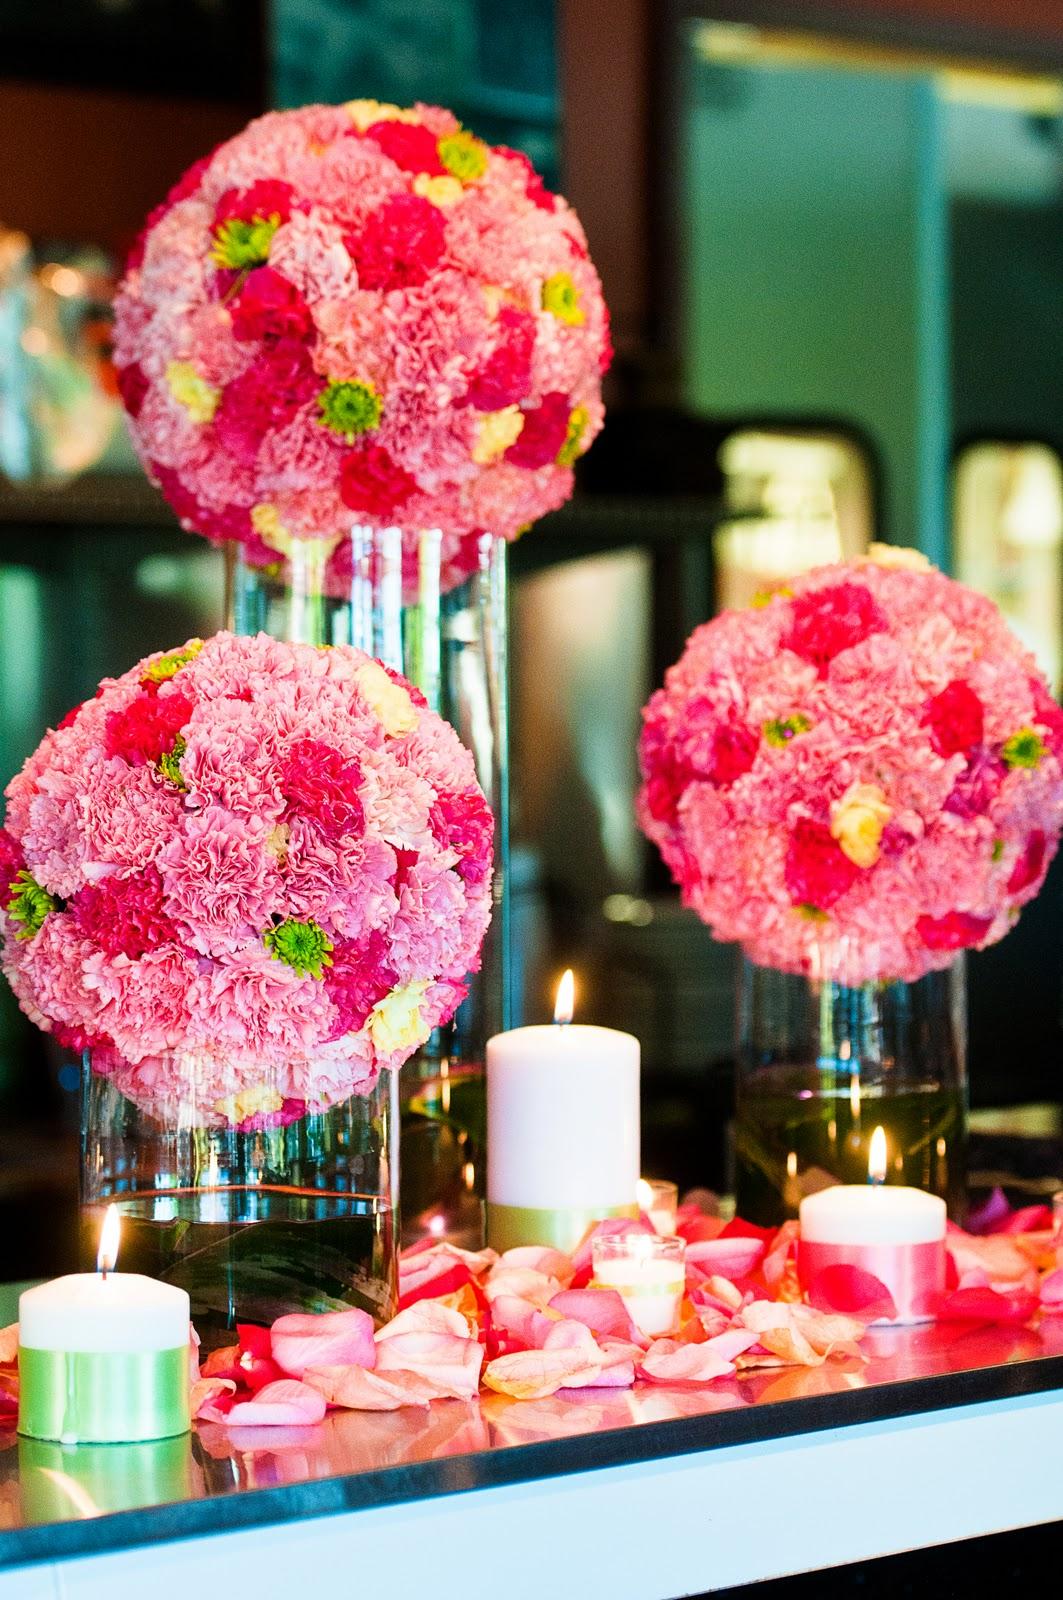 Pink Posey Design November 2010